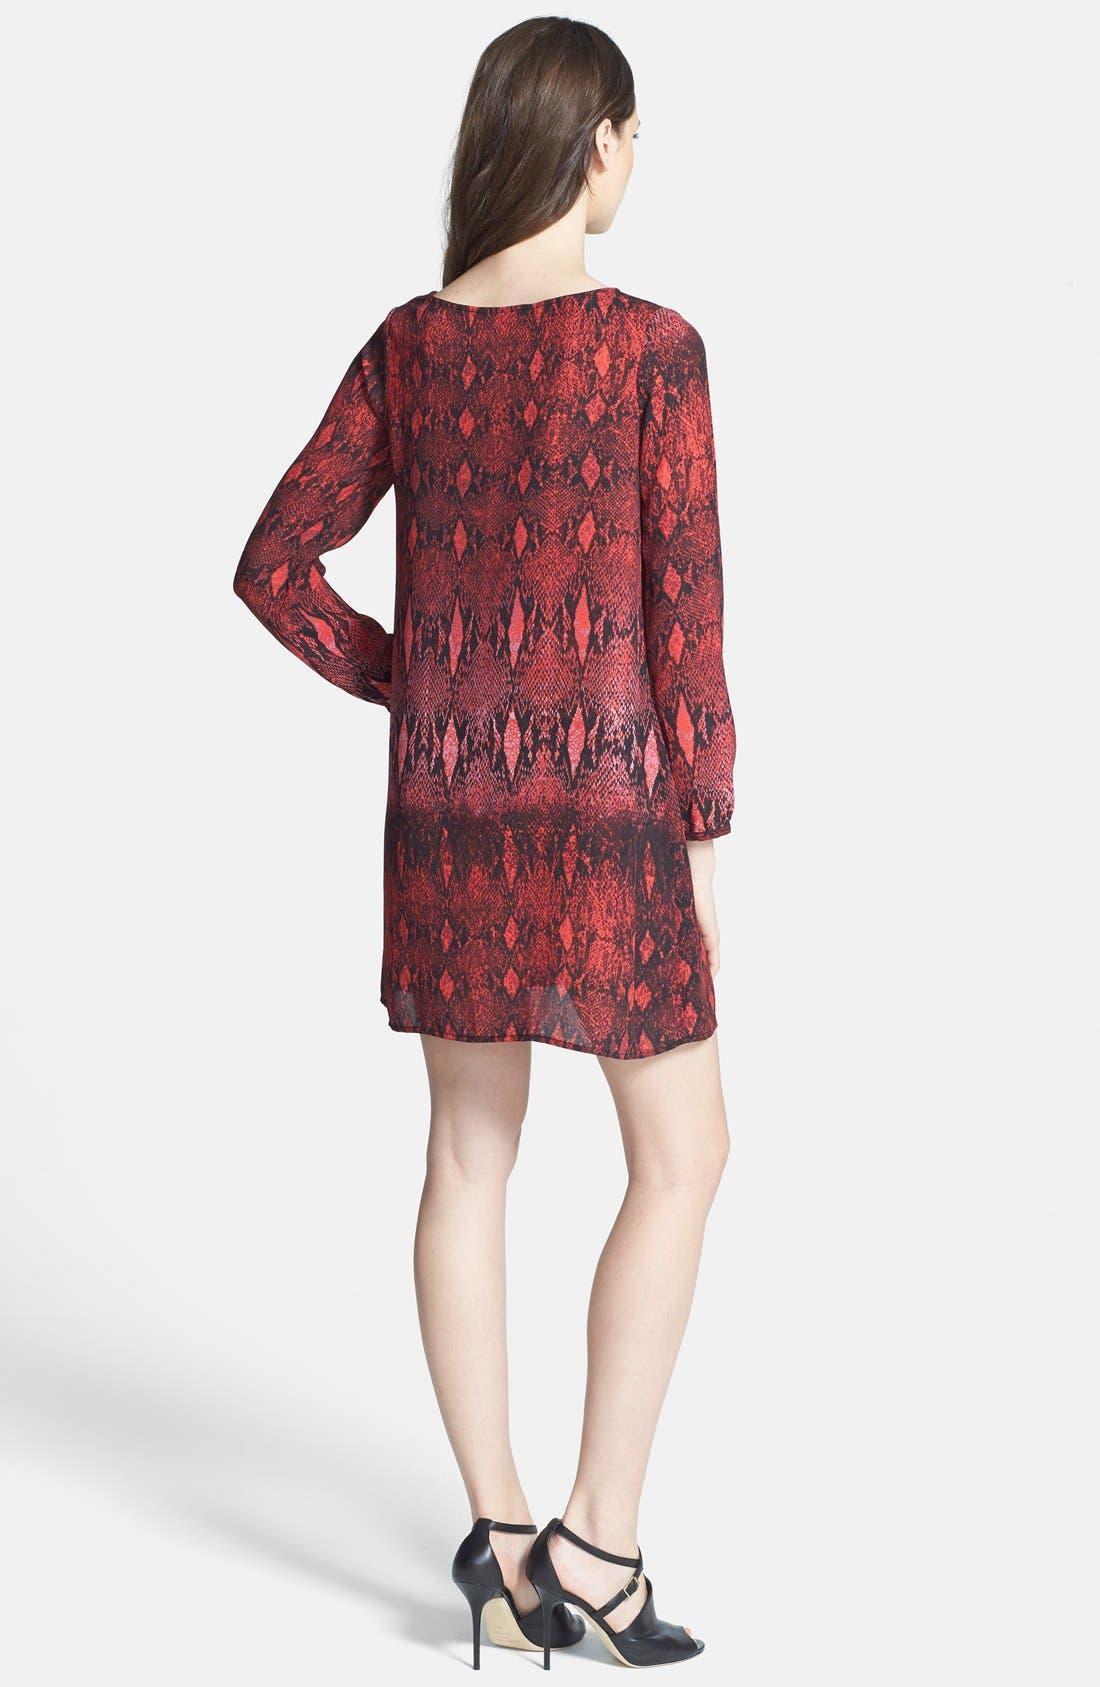 BB DAKOTA, 'Vasha' Snakeskin Print Shift Dress, Alternate thumbnail 3, color, 600